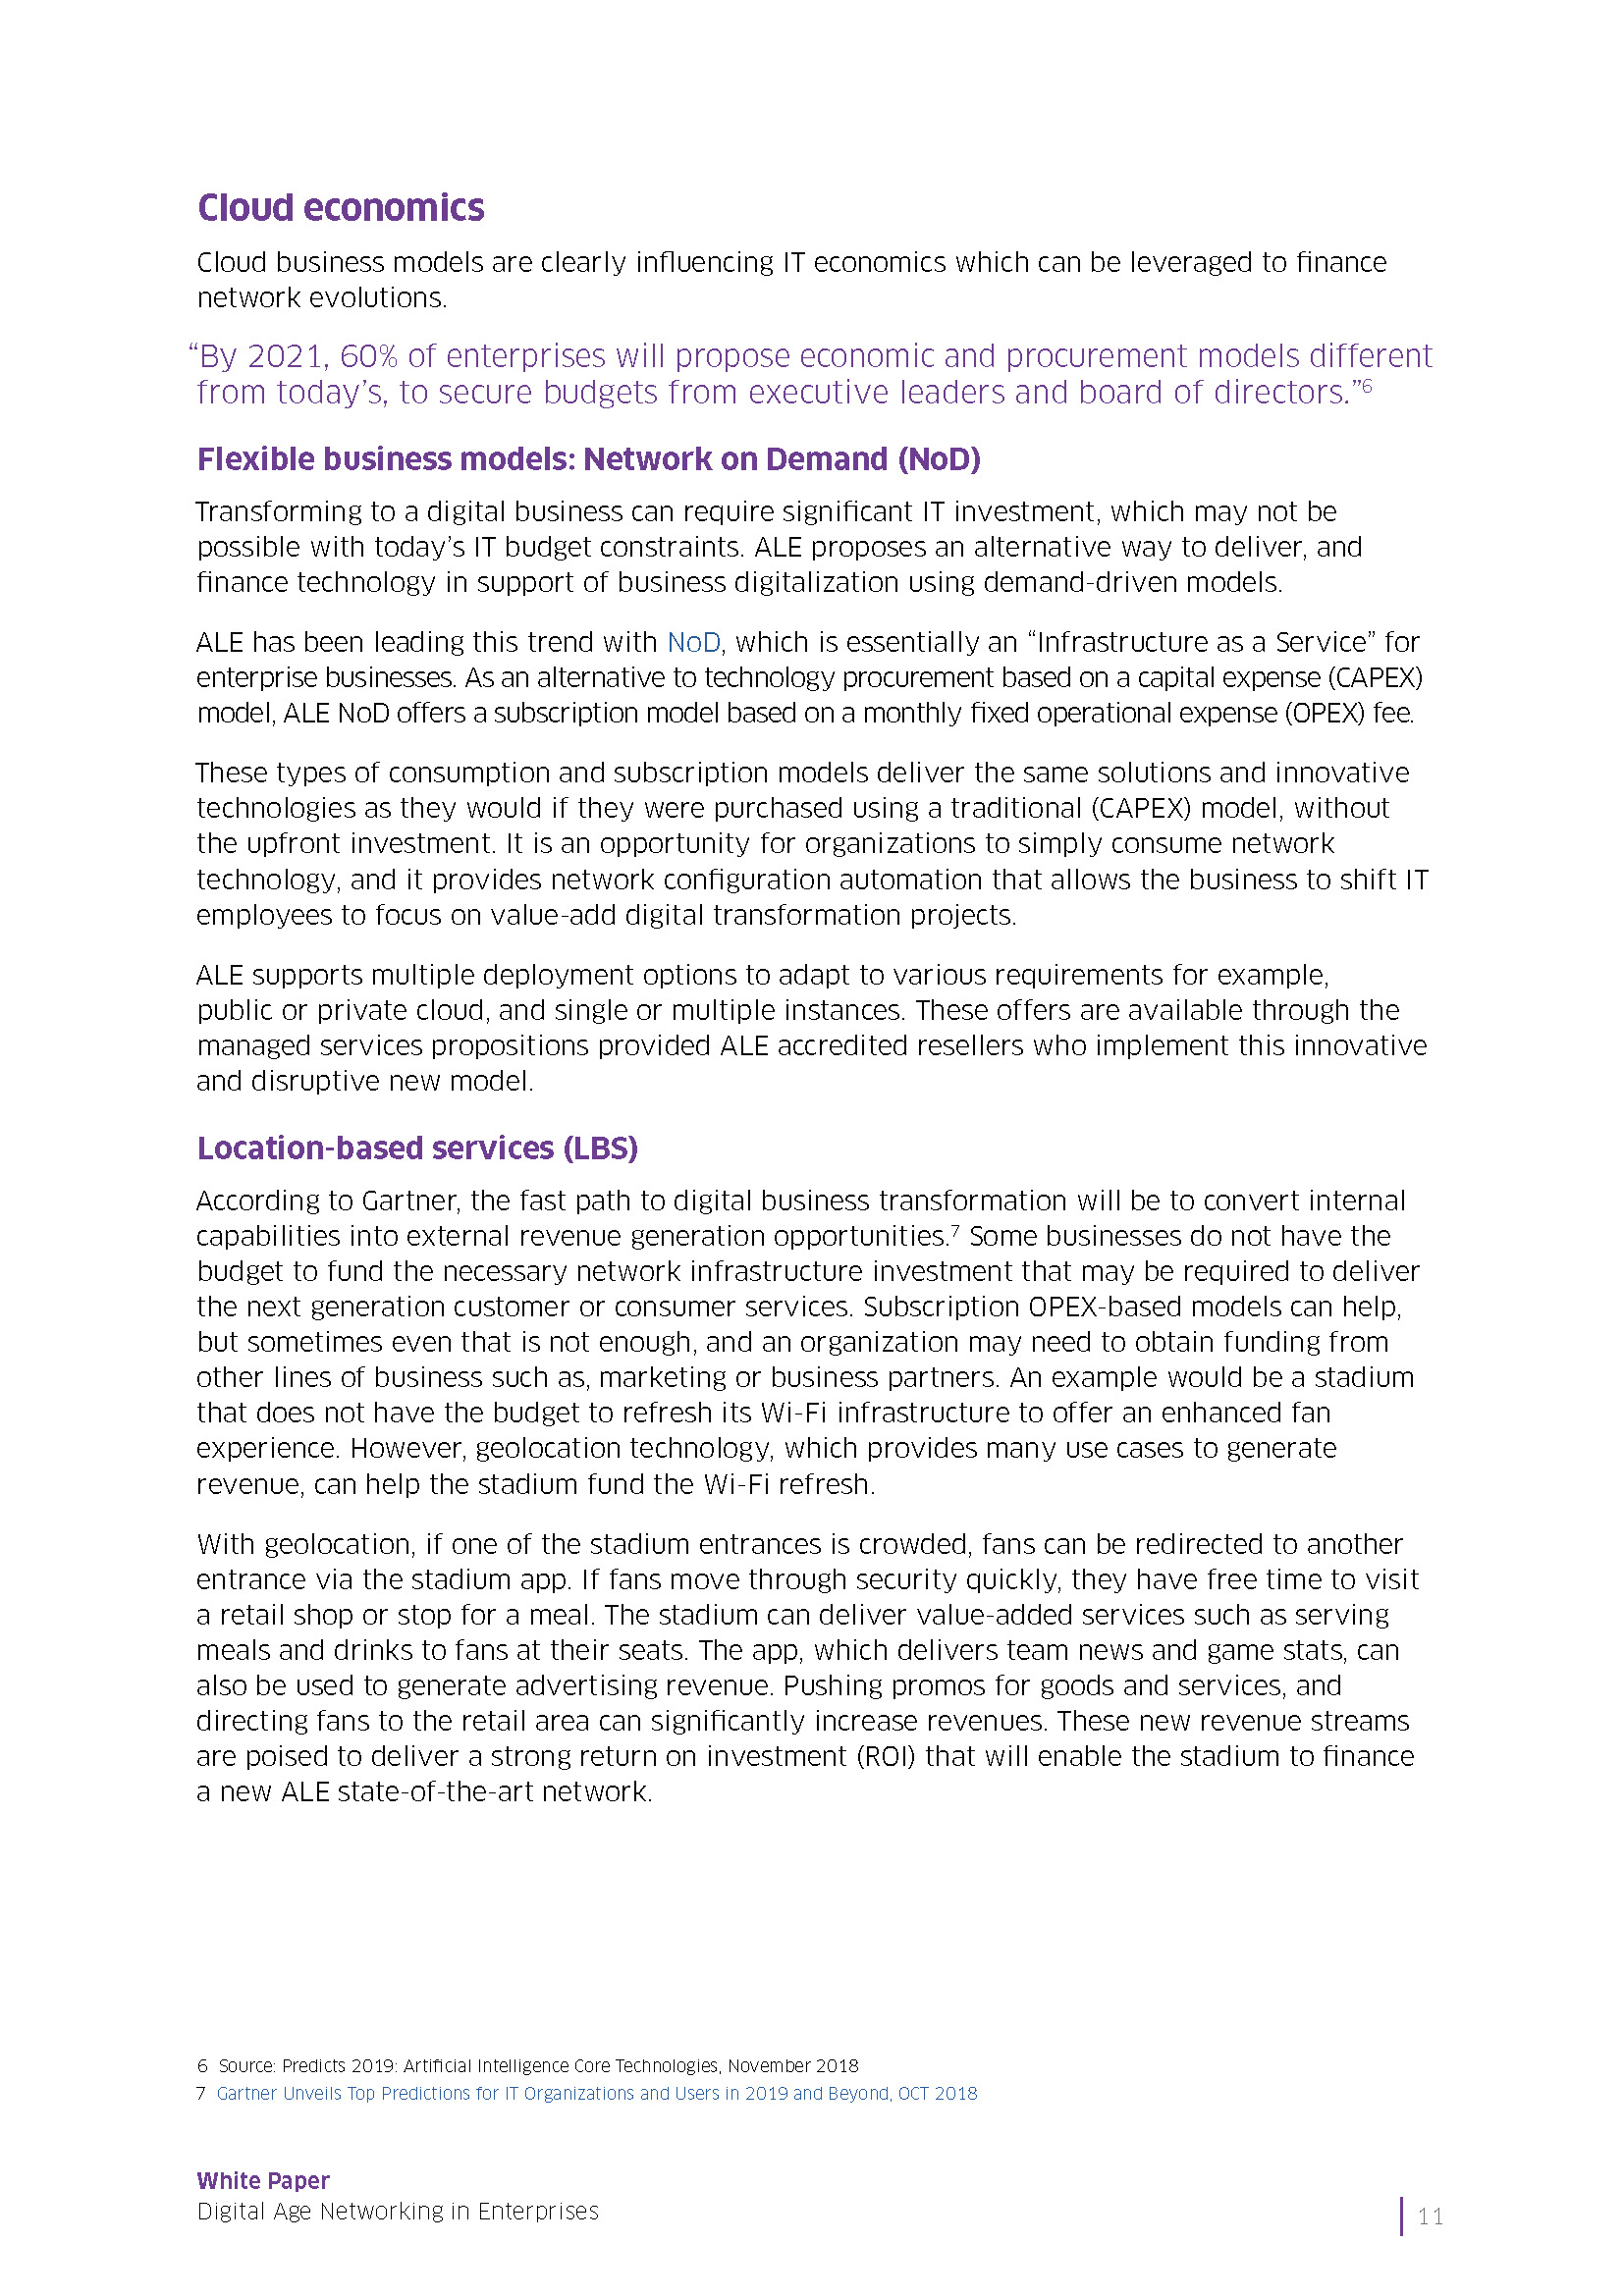 digital-age-networking-enterprises_Page_11